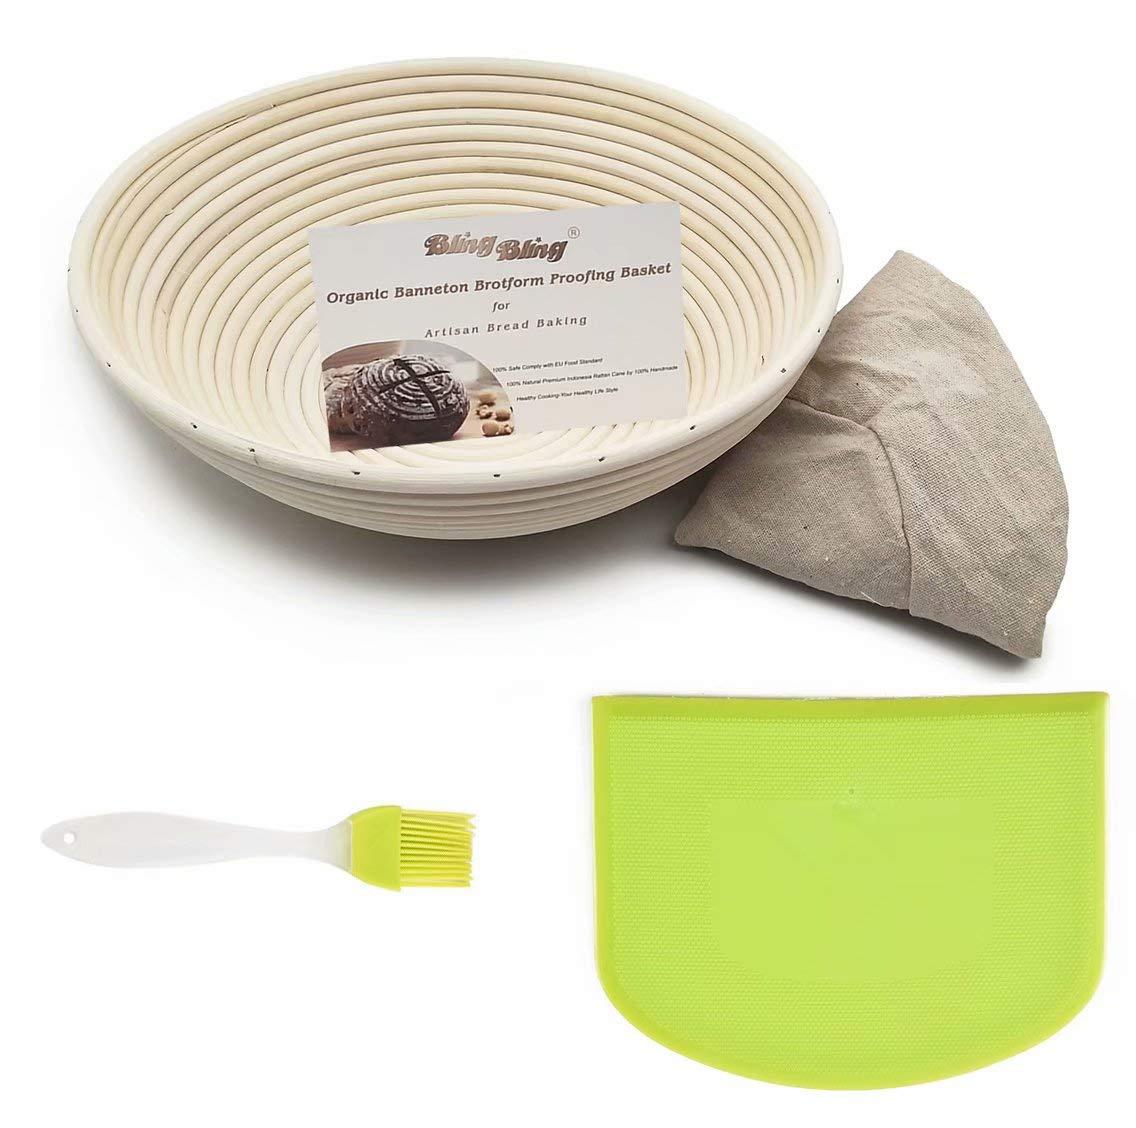 Bread Proofing Basket 7 Inch Best for Artisan Bread Making Sourdough and Dough Scraper Banneton Rattan OBeauty